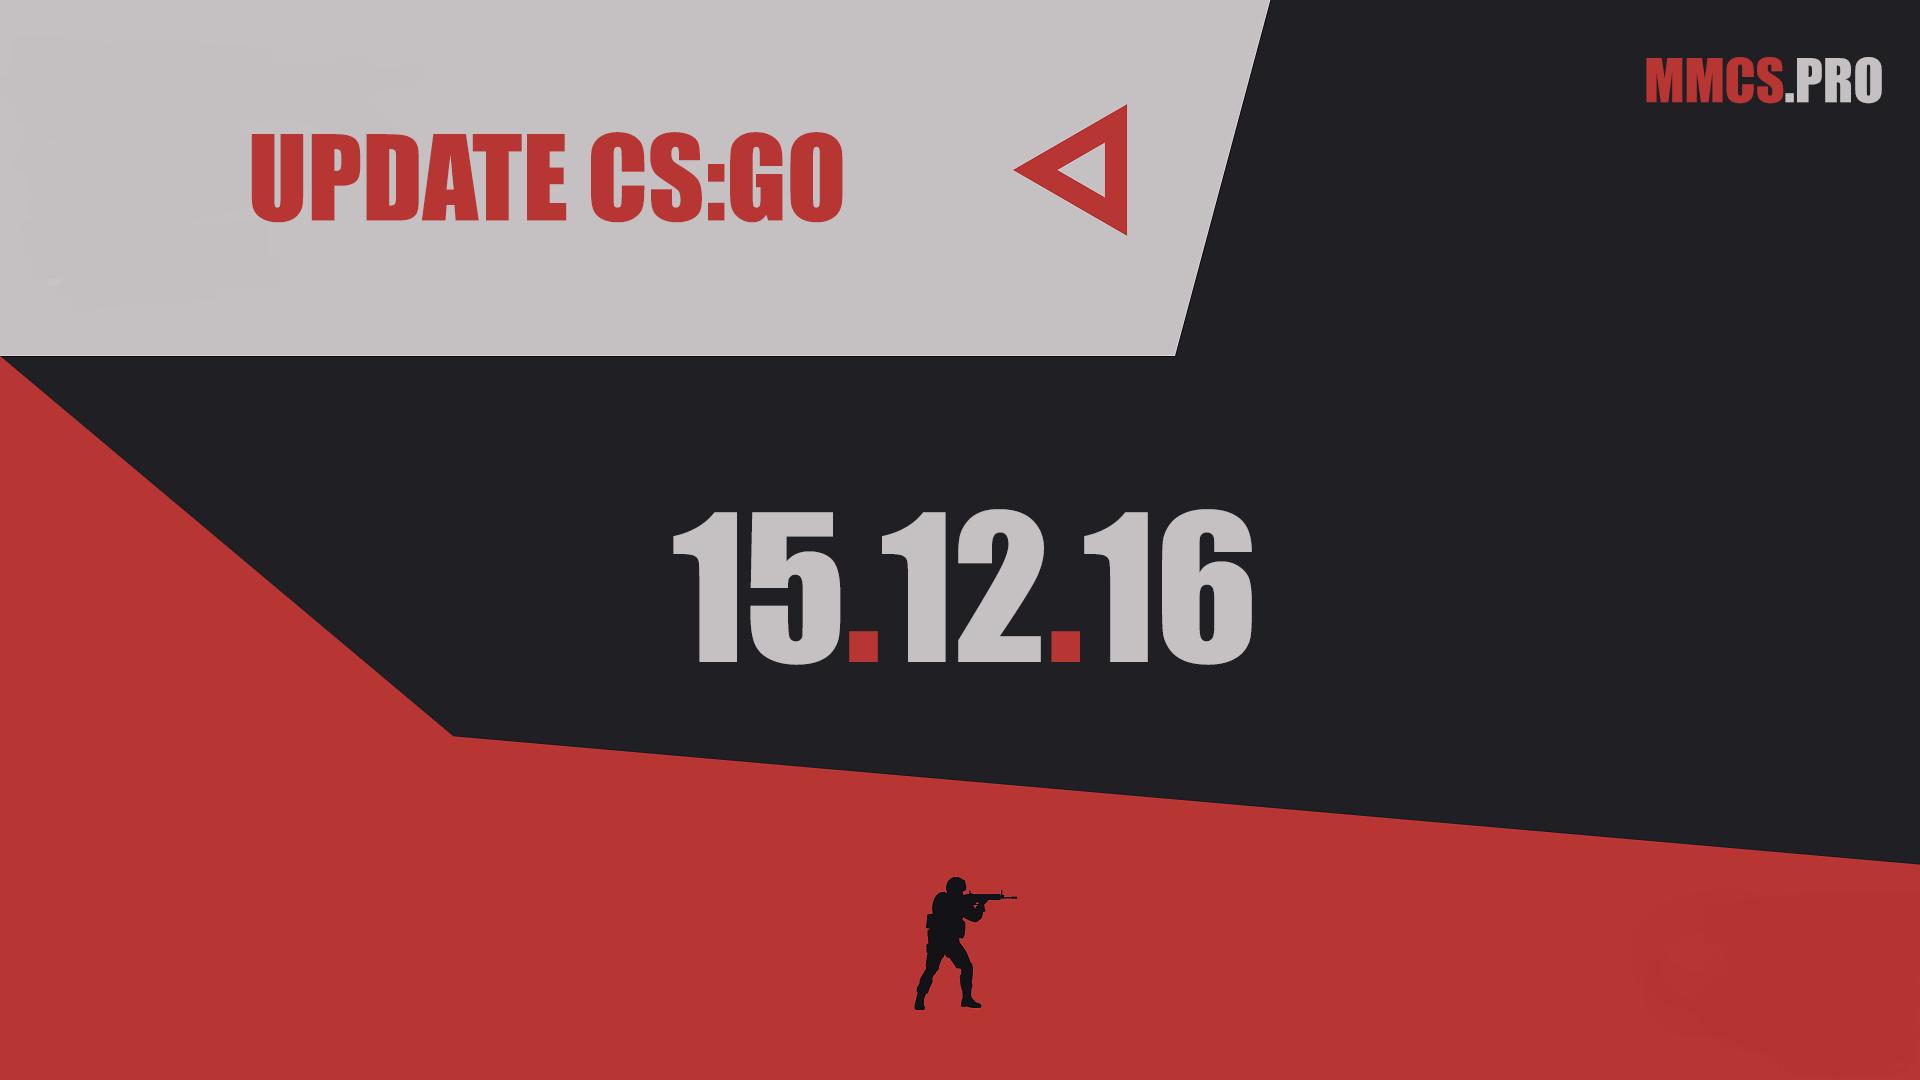 https://mmcs.pro/update-csgo-15-12-2016-valve/